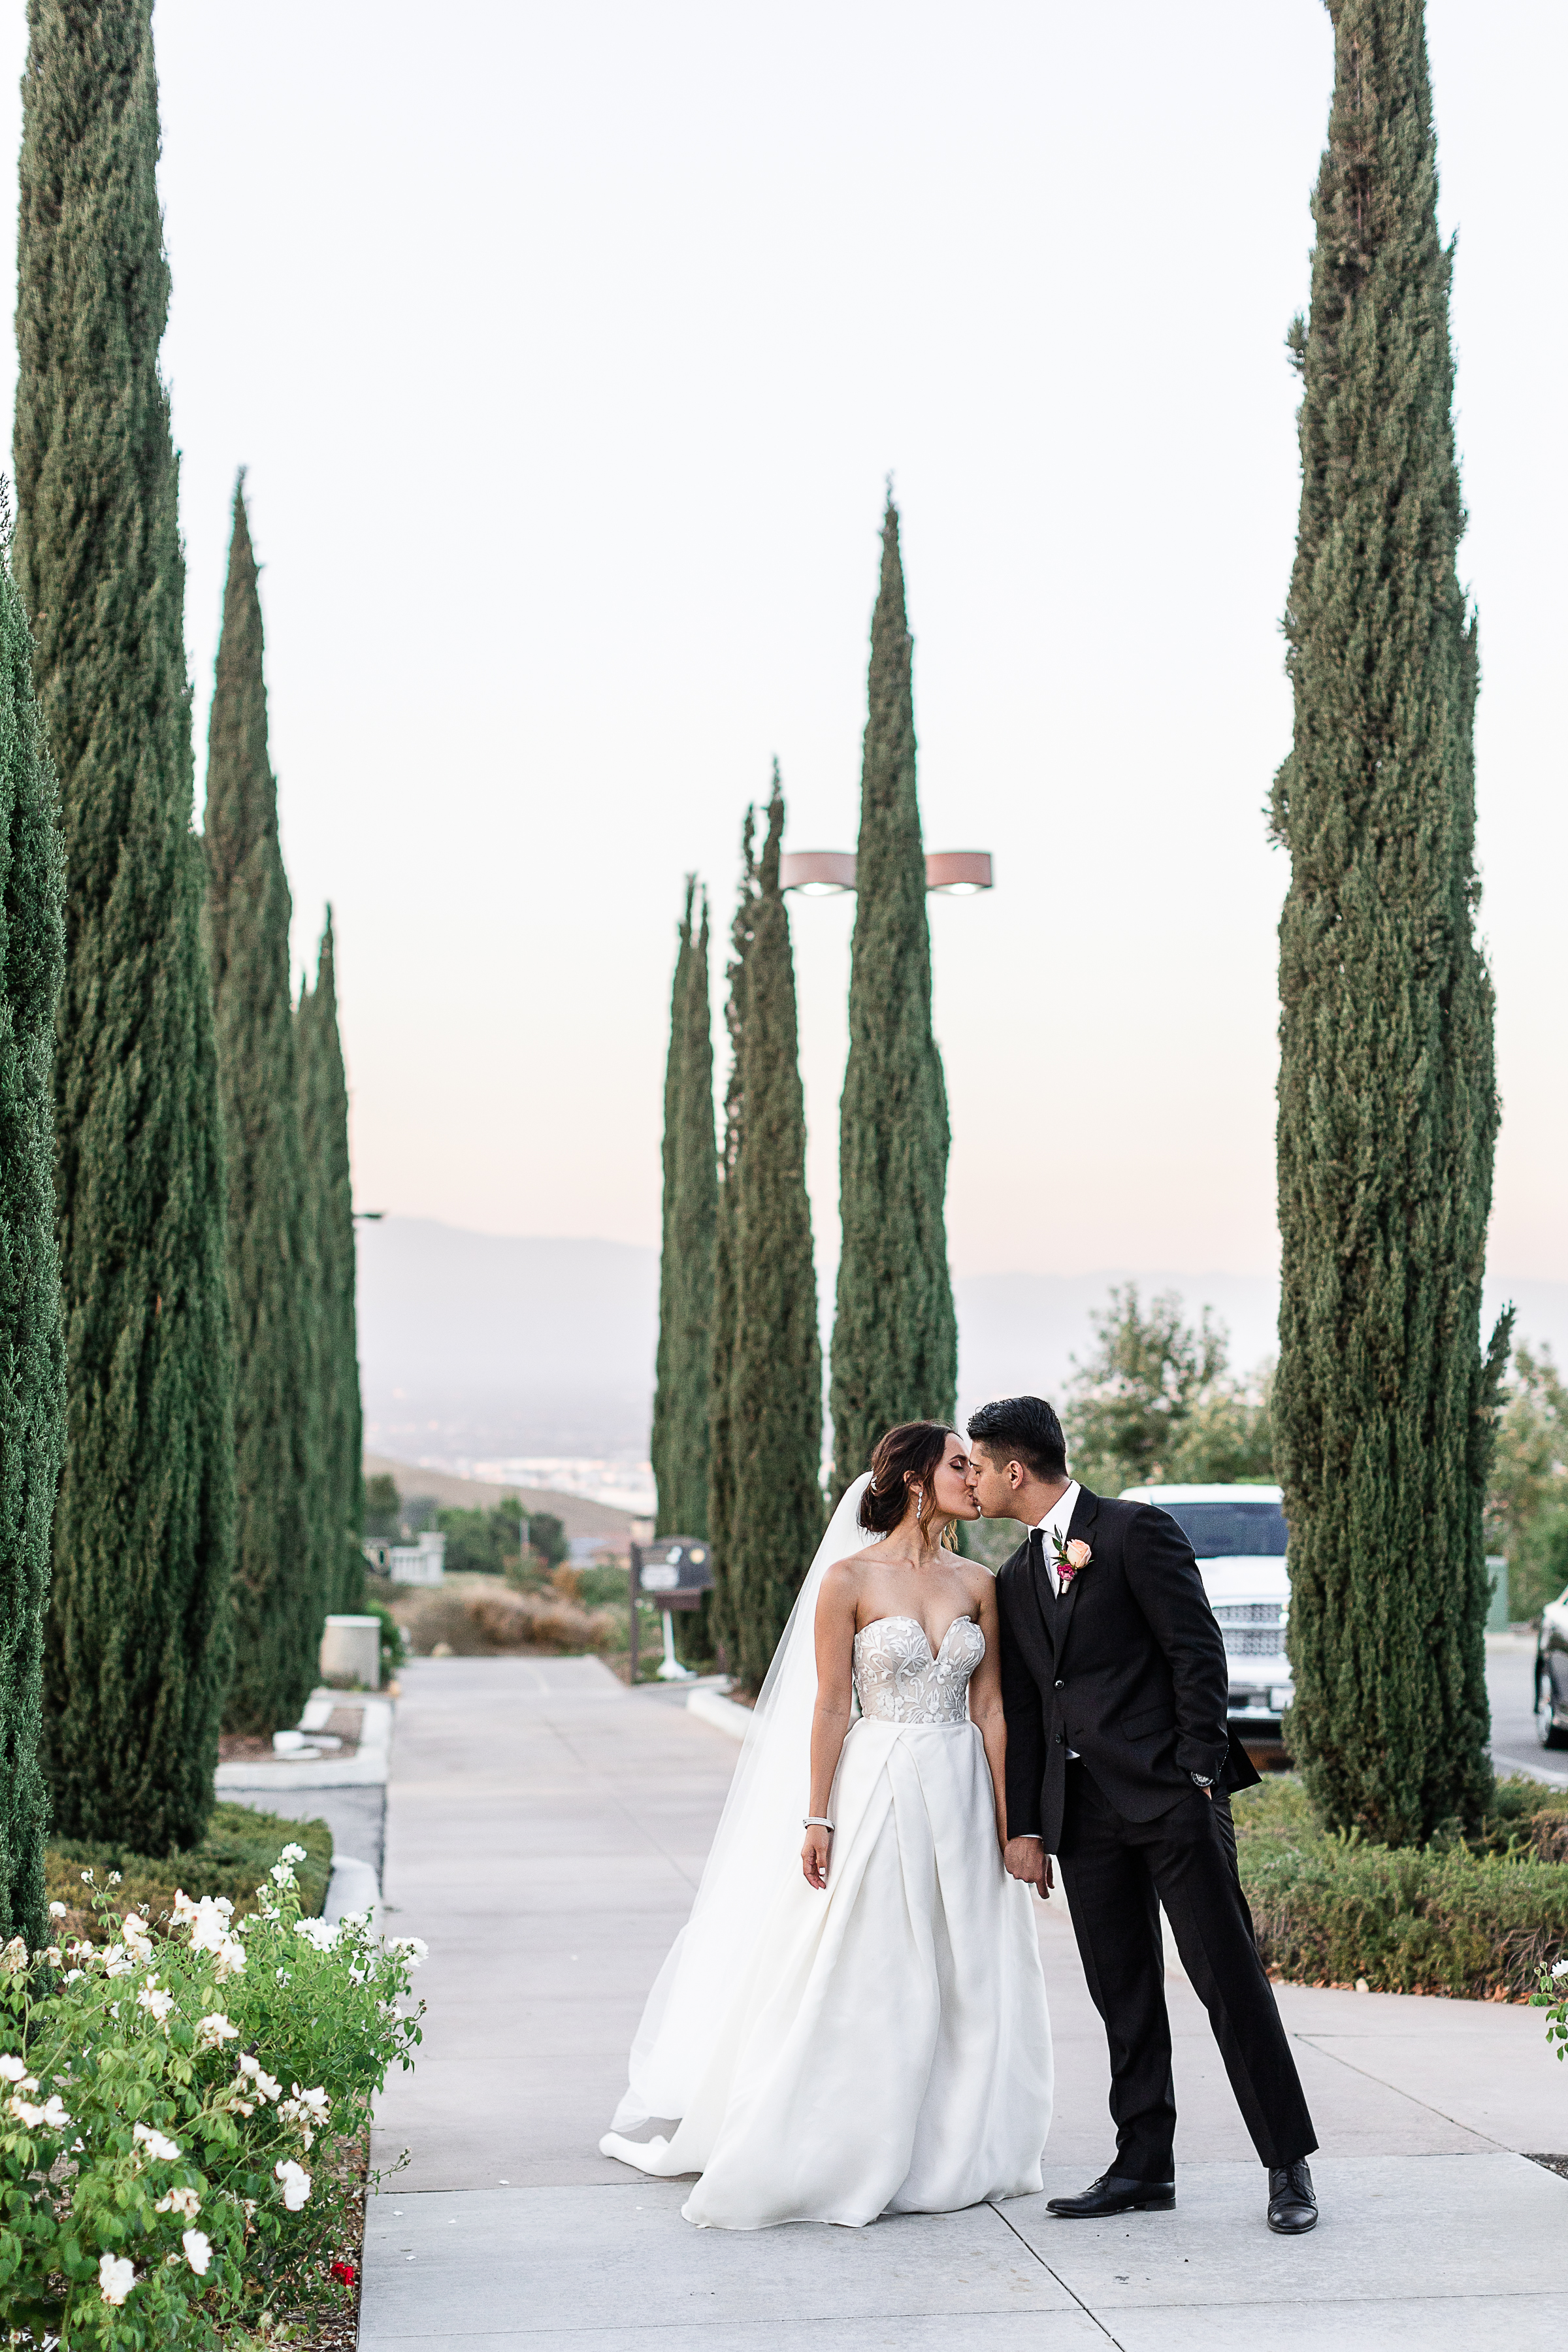 Medina and Arash's Vellano Country Club Wedding, Chino Hills-24.jpg